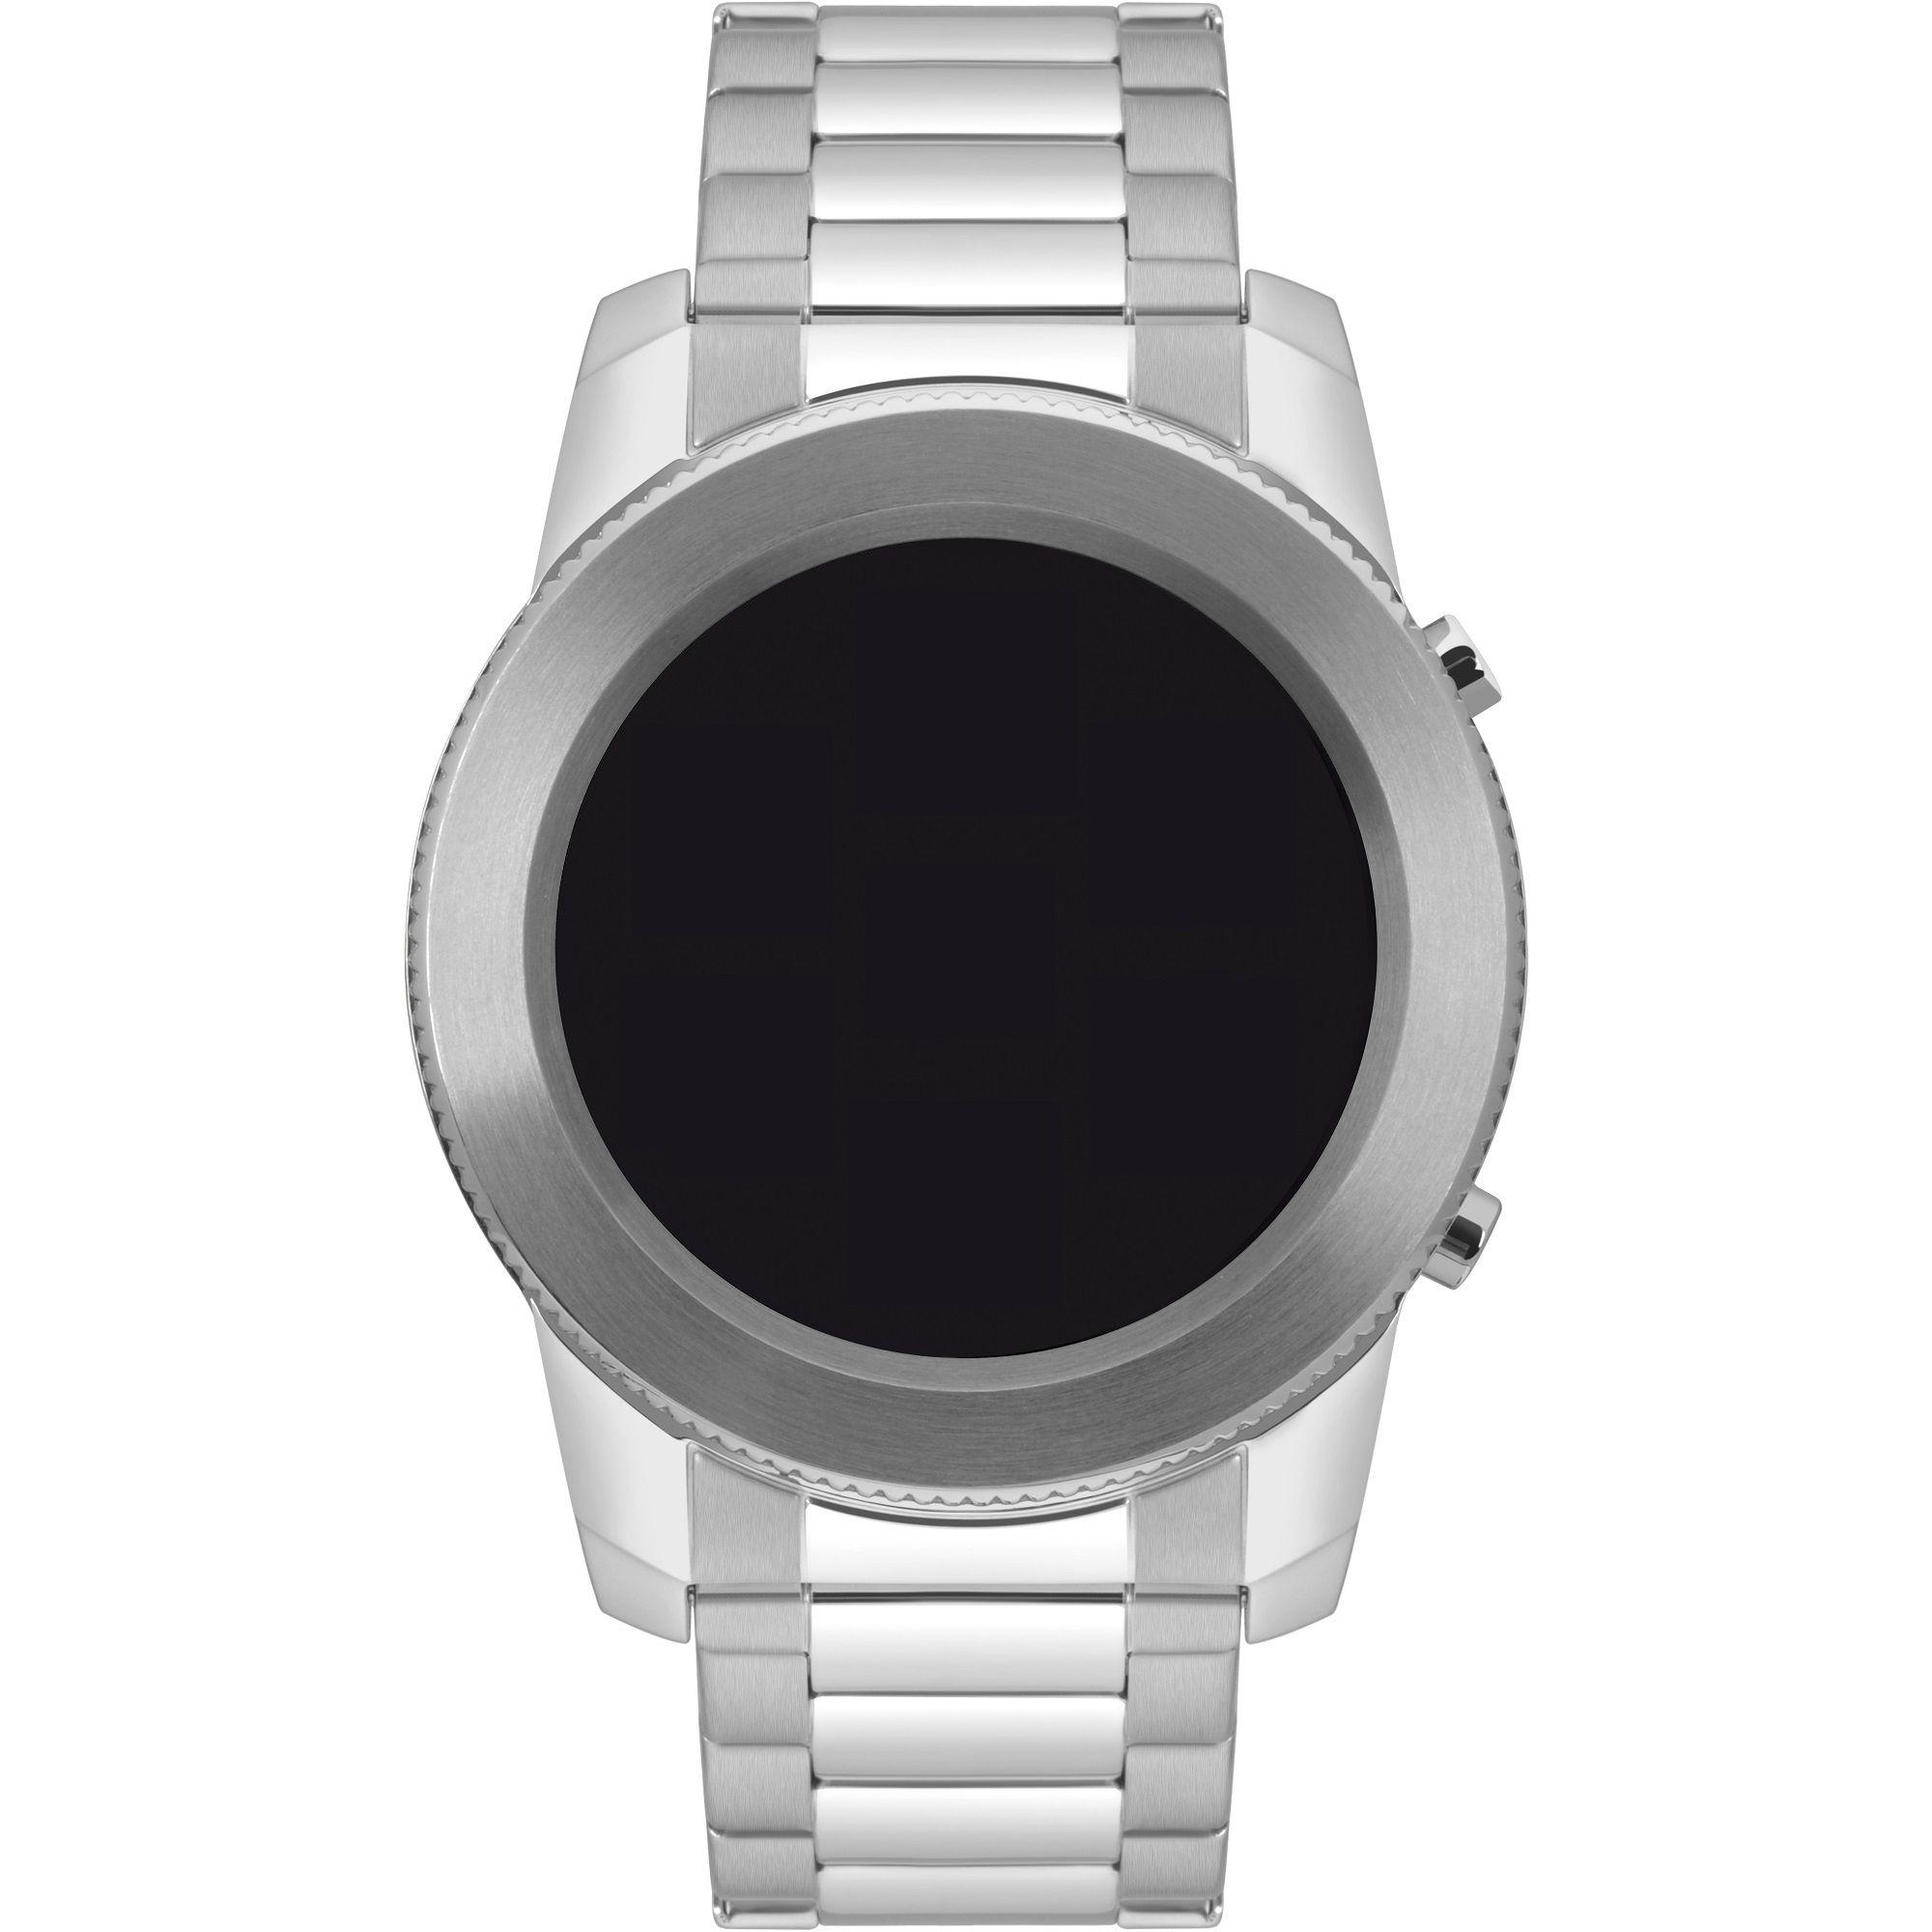 97c6f1f1fe1d9 ... Relógio Masculino Technos Connect Smartwatch M1AA 1P Aço Prata - Vitrino  Relógios